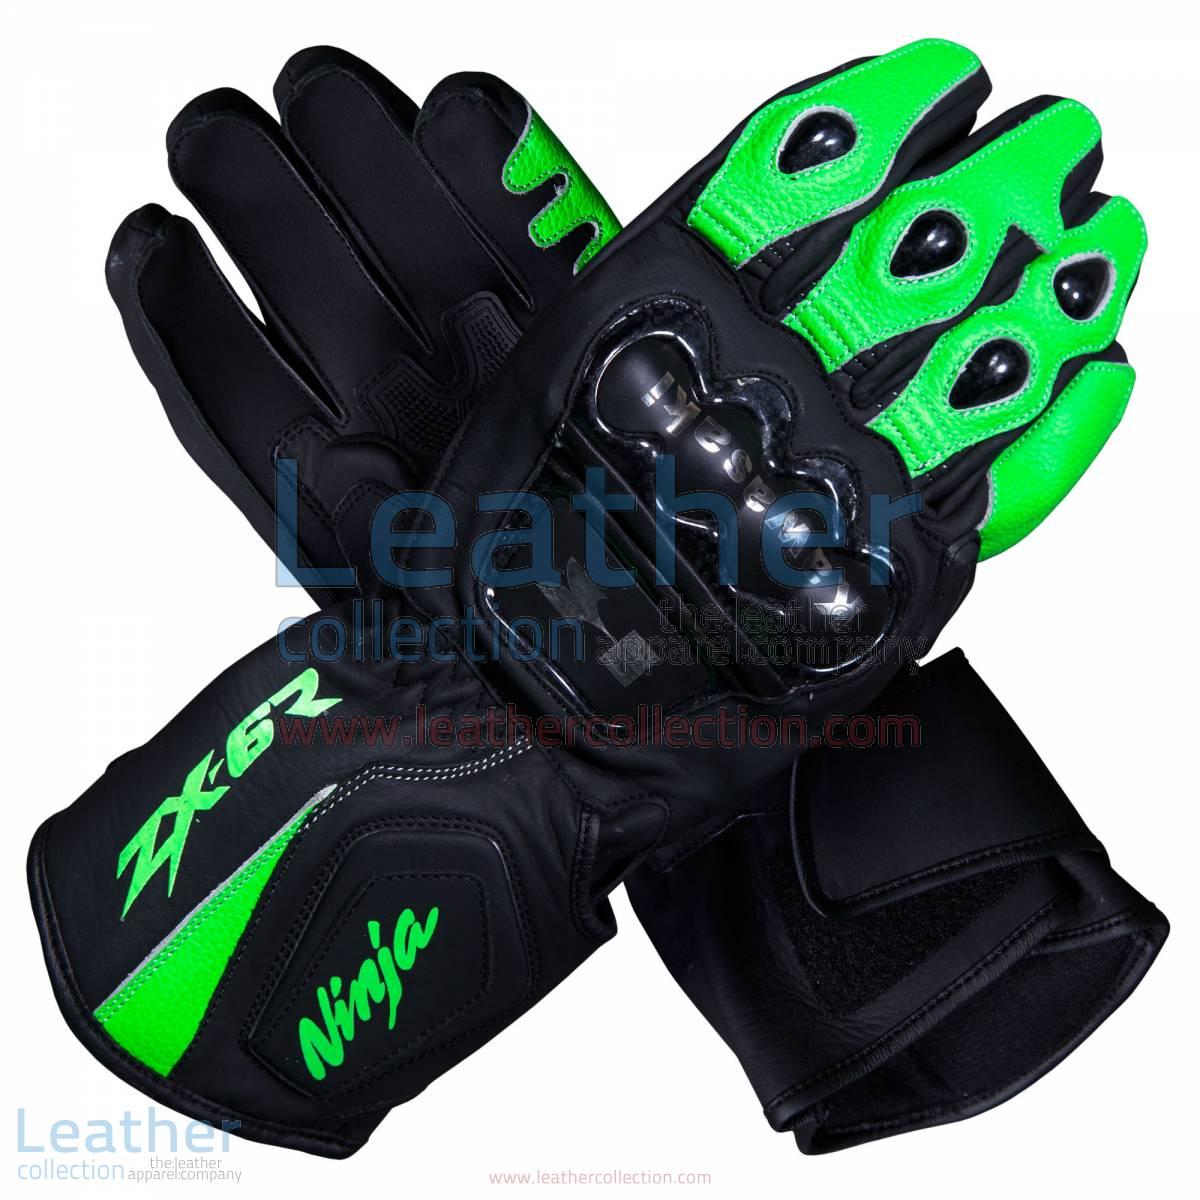 Kawasaki Ninja ZX-6R Leather Motorcycle Gloves